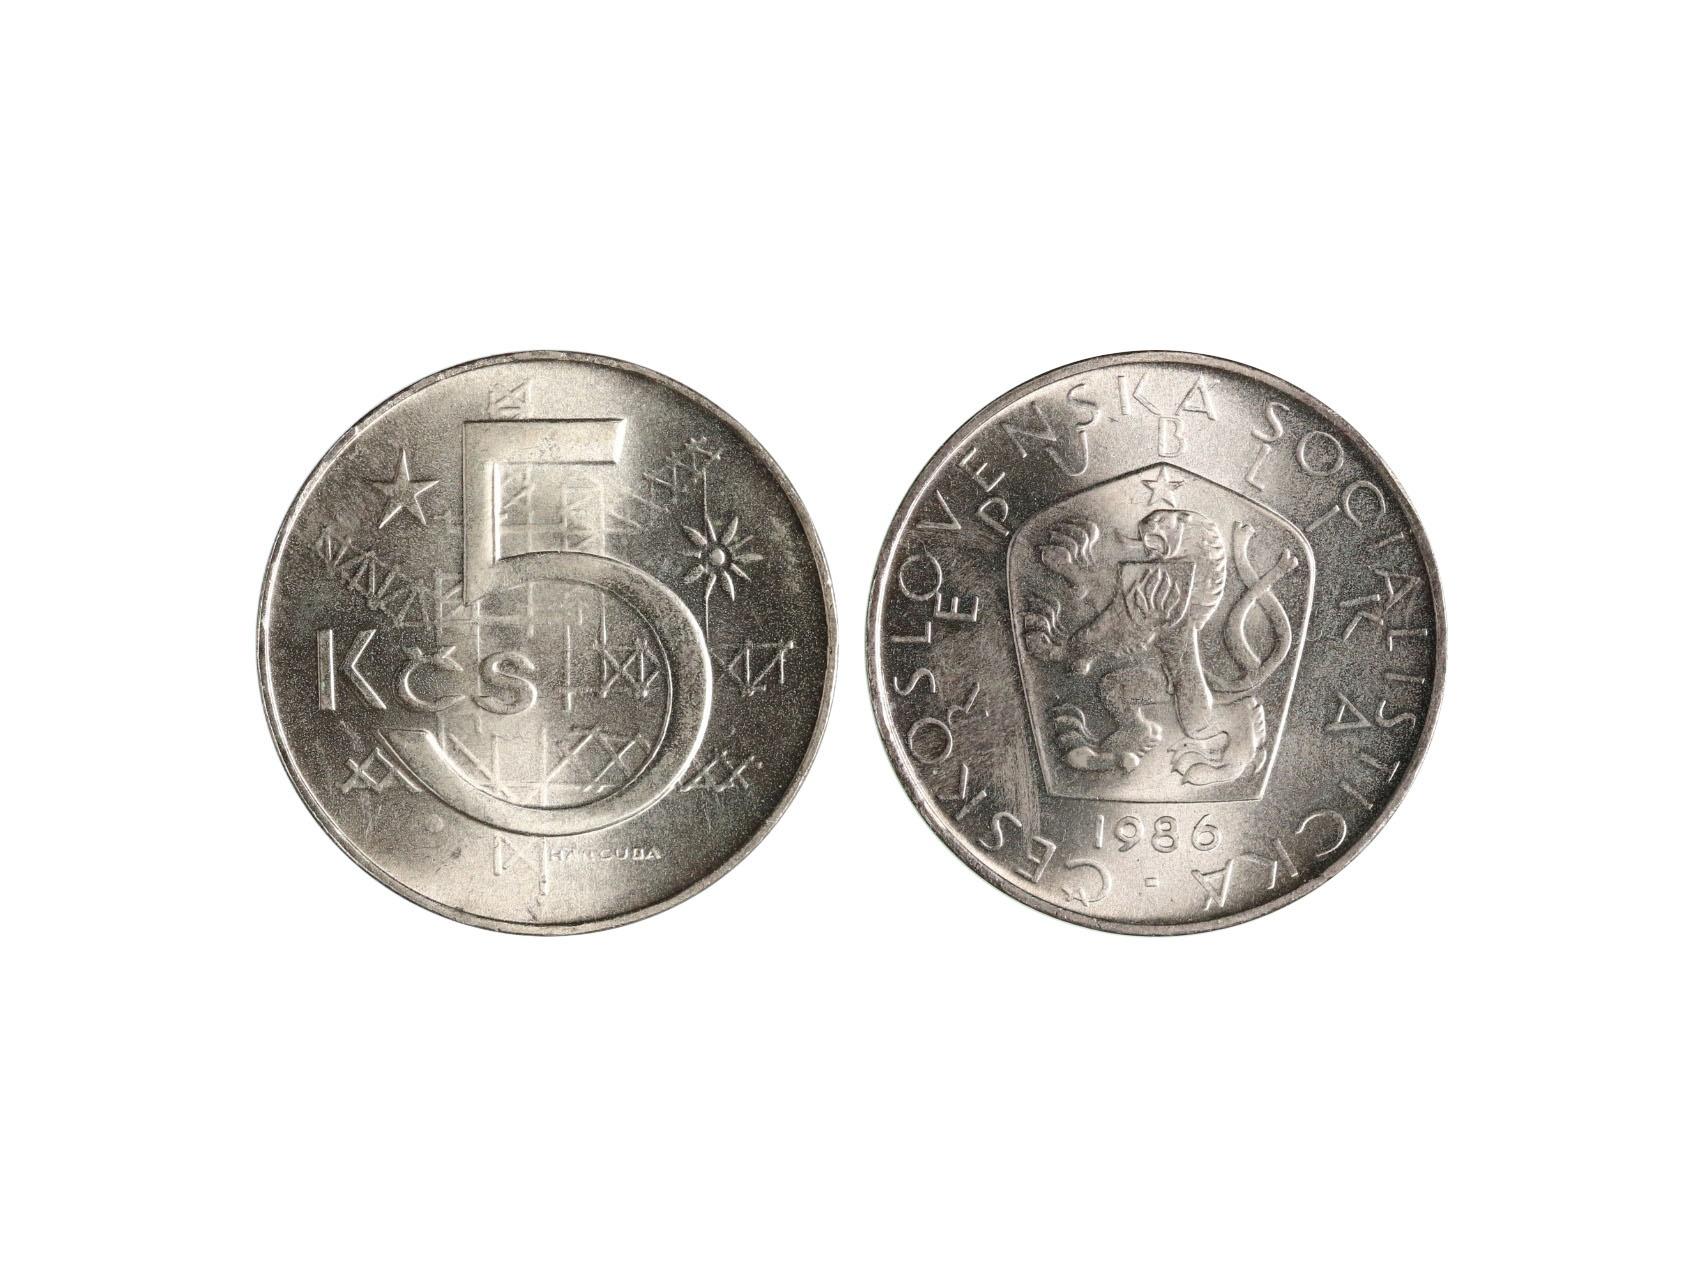 ČSSR 1953-1992 - 5 Koruna 1986, N69